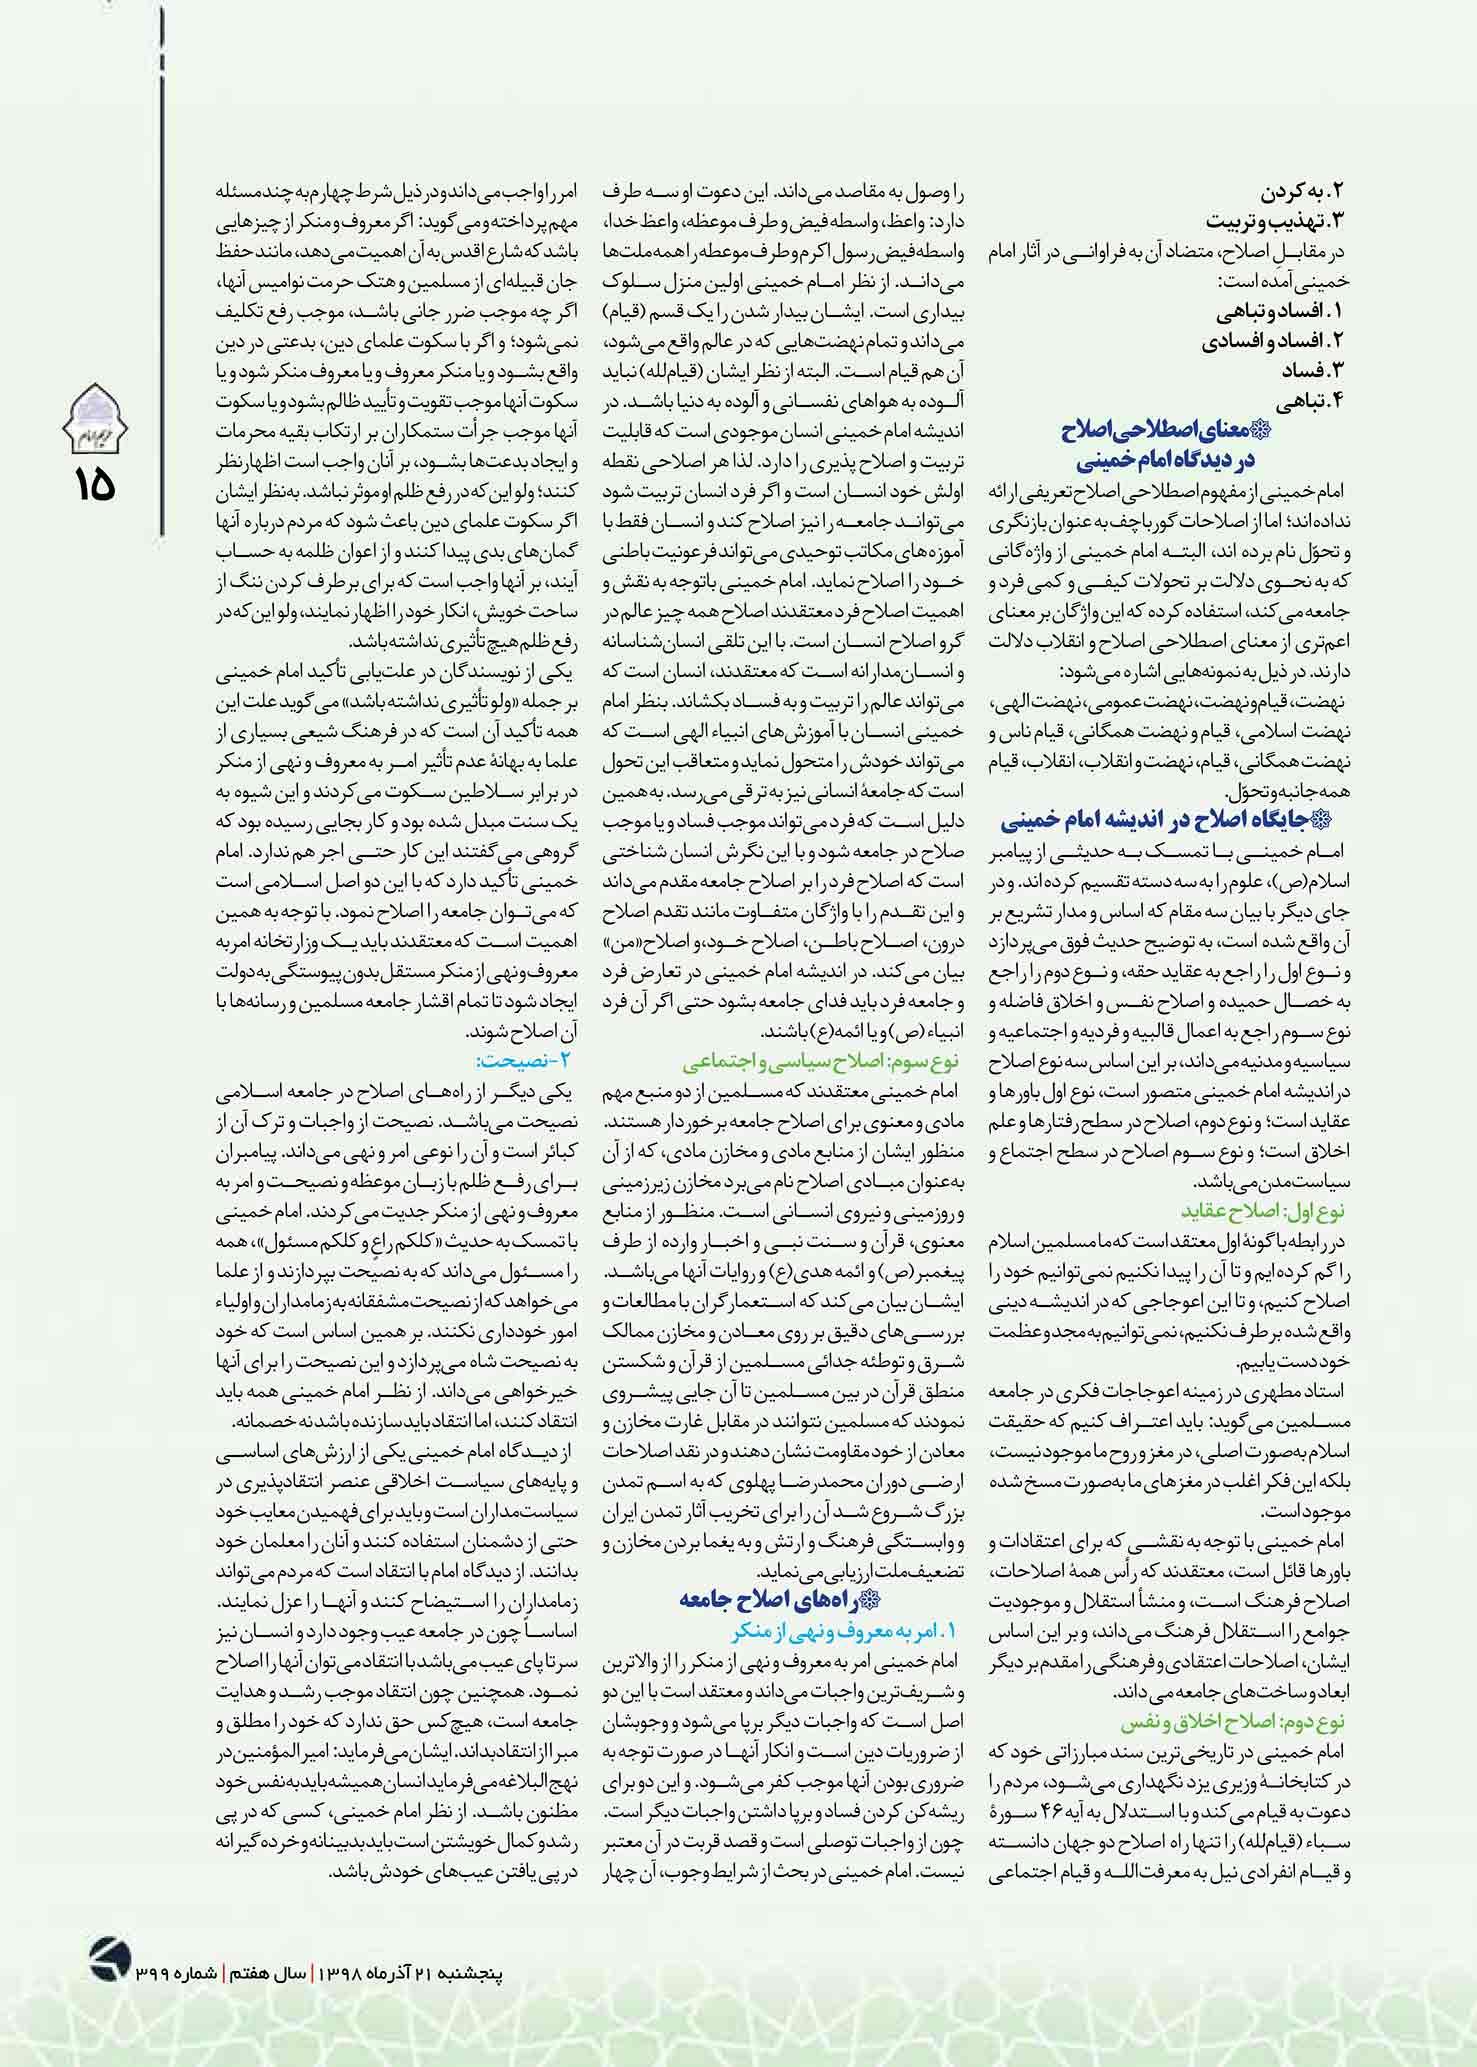 C:\Users\a.khalojini.ICPIKW\Desktop\399\@harim_emam399-15.jpg